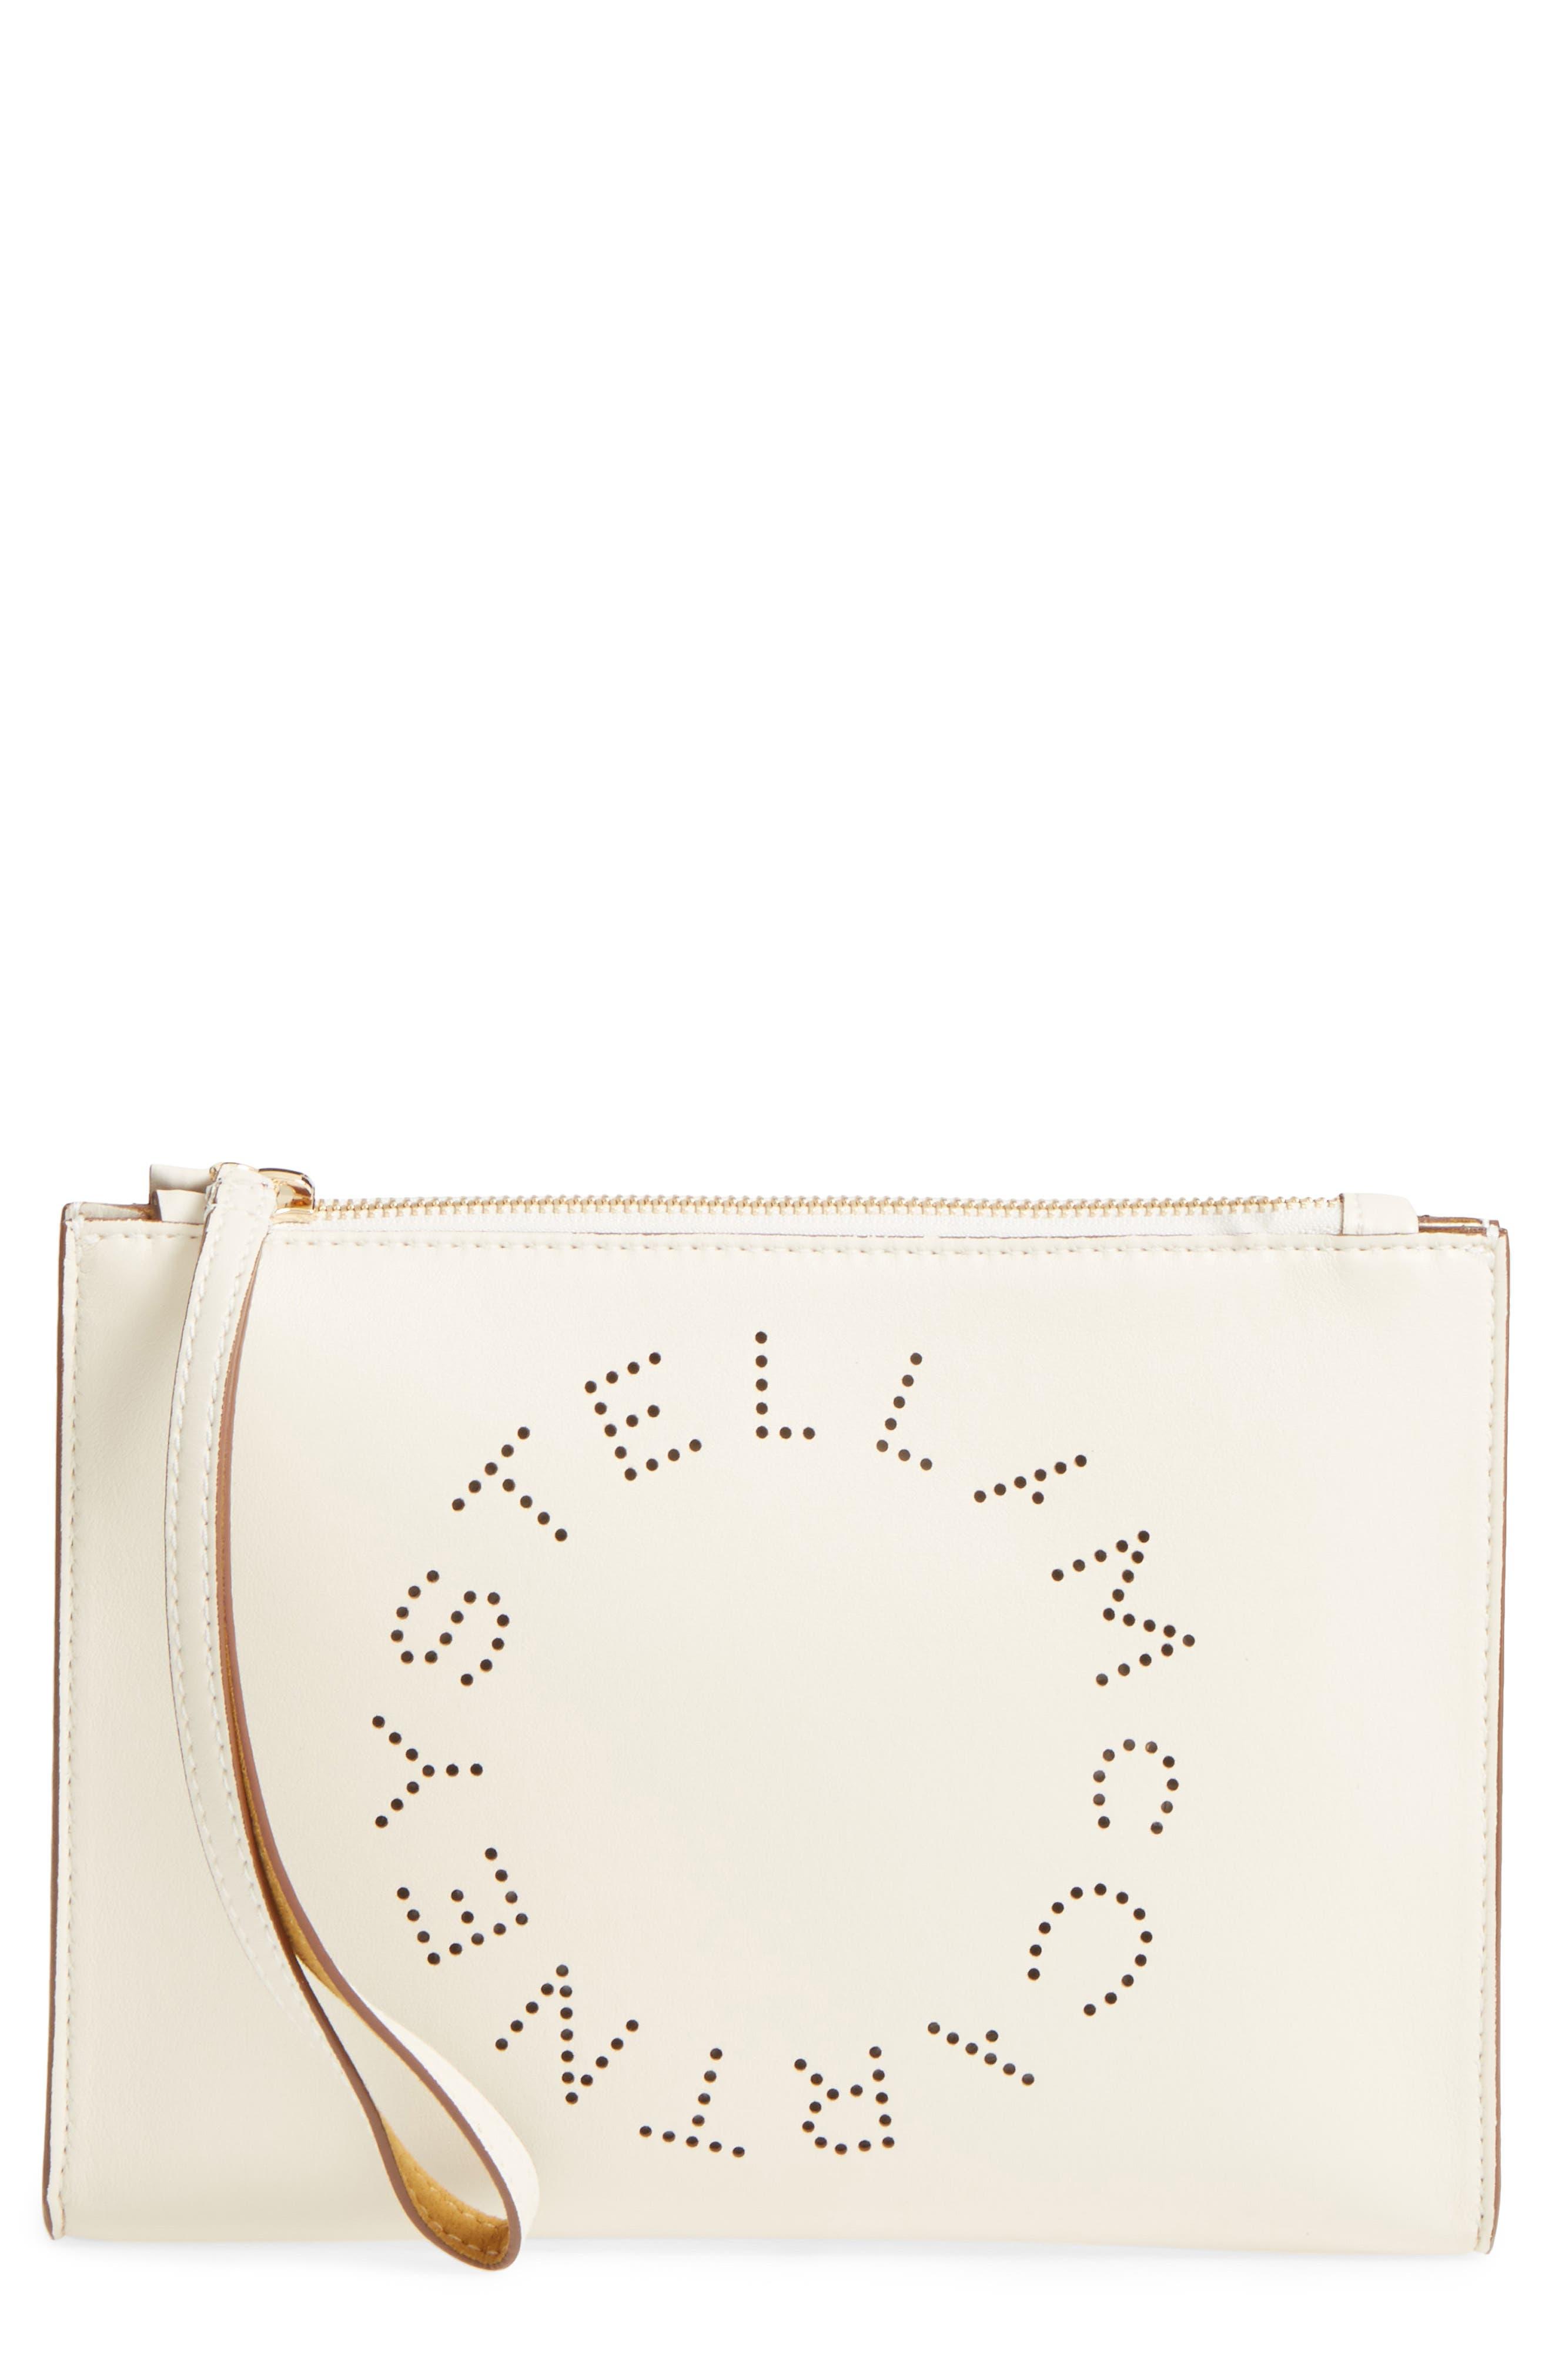 Main Image - Stella McCartney Alter Faux Nappa Leather Wristlet Clutch